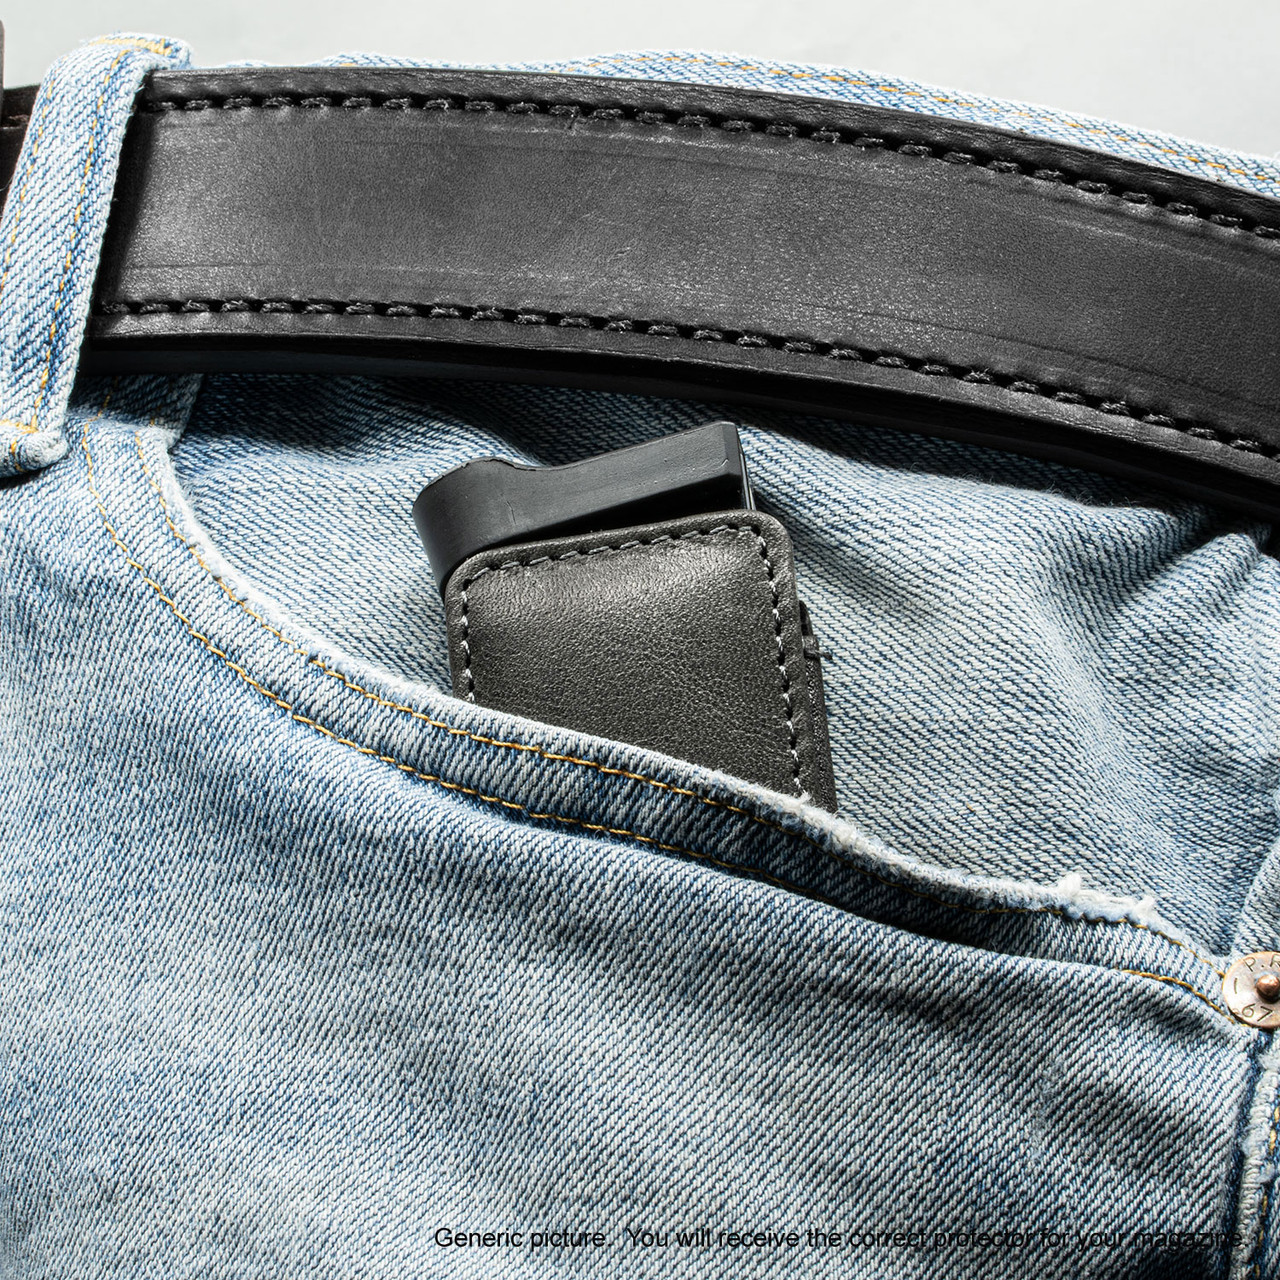 Mossberg MC2c Black Freedom Magazine Pocket Protector